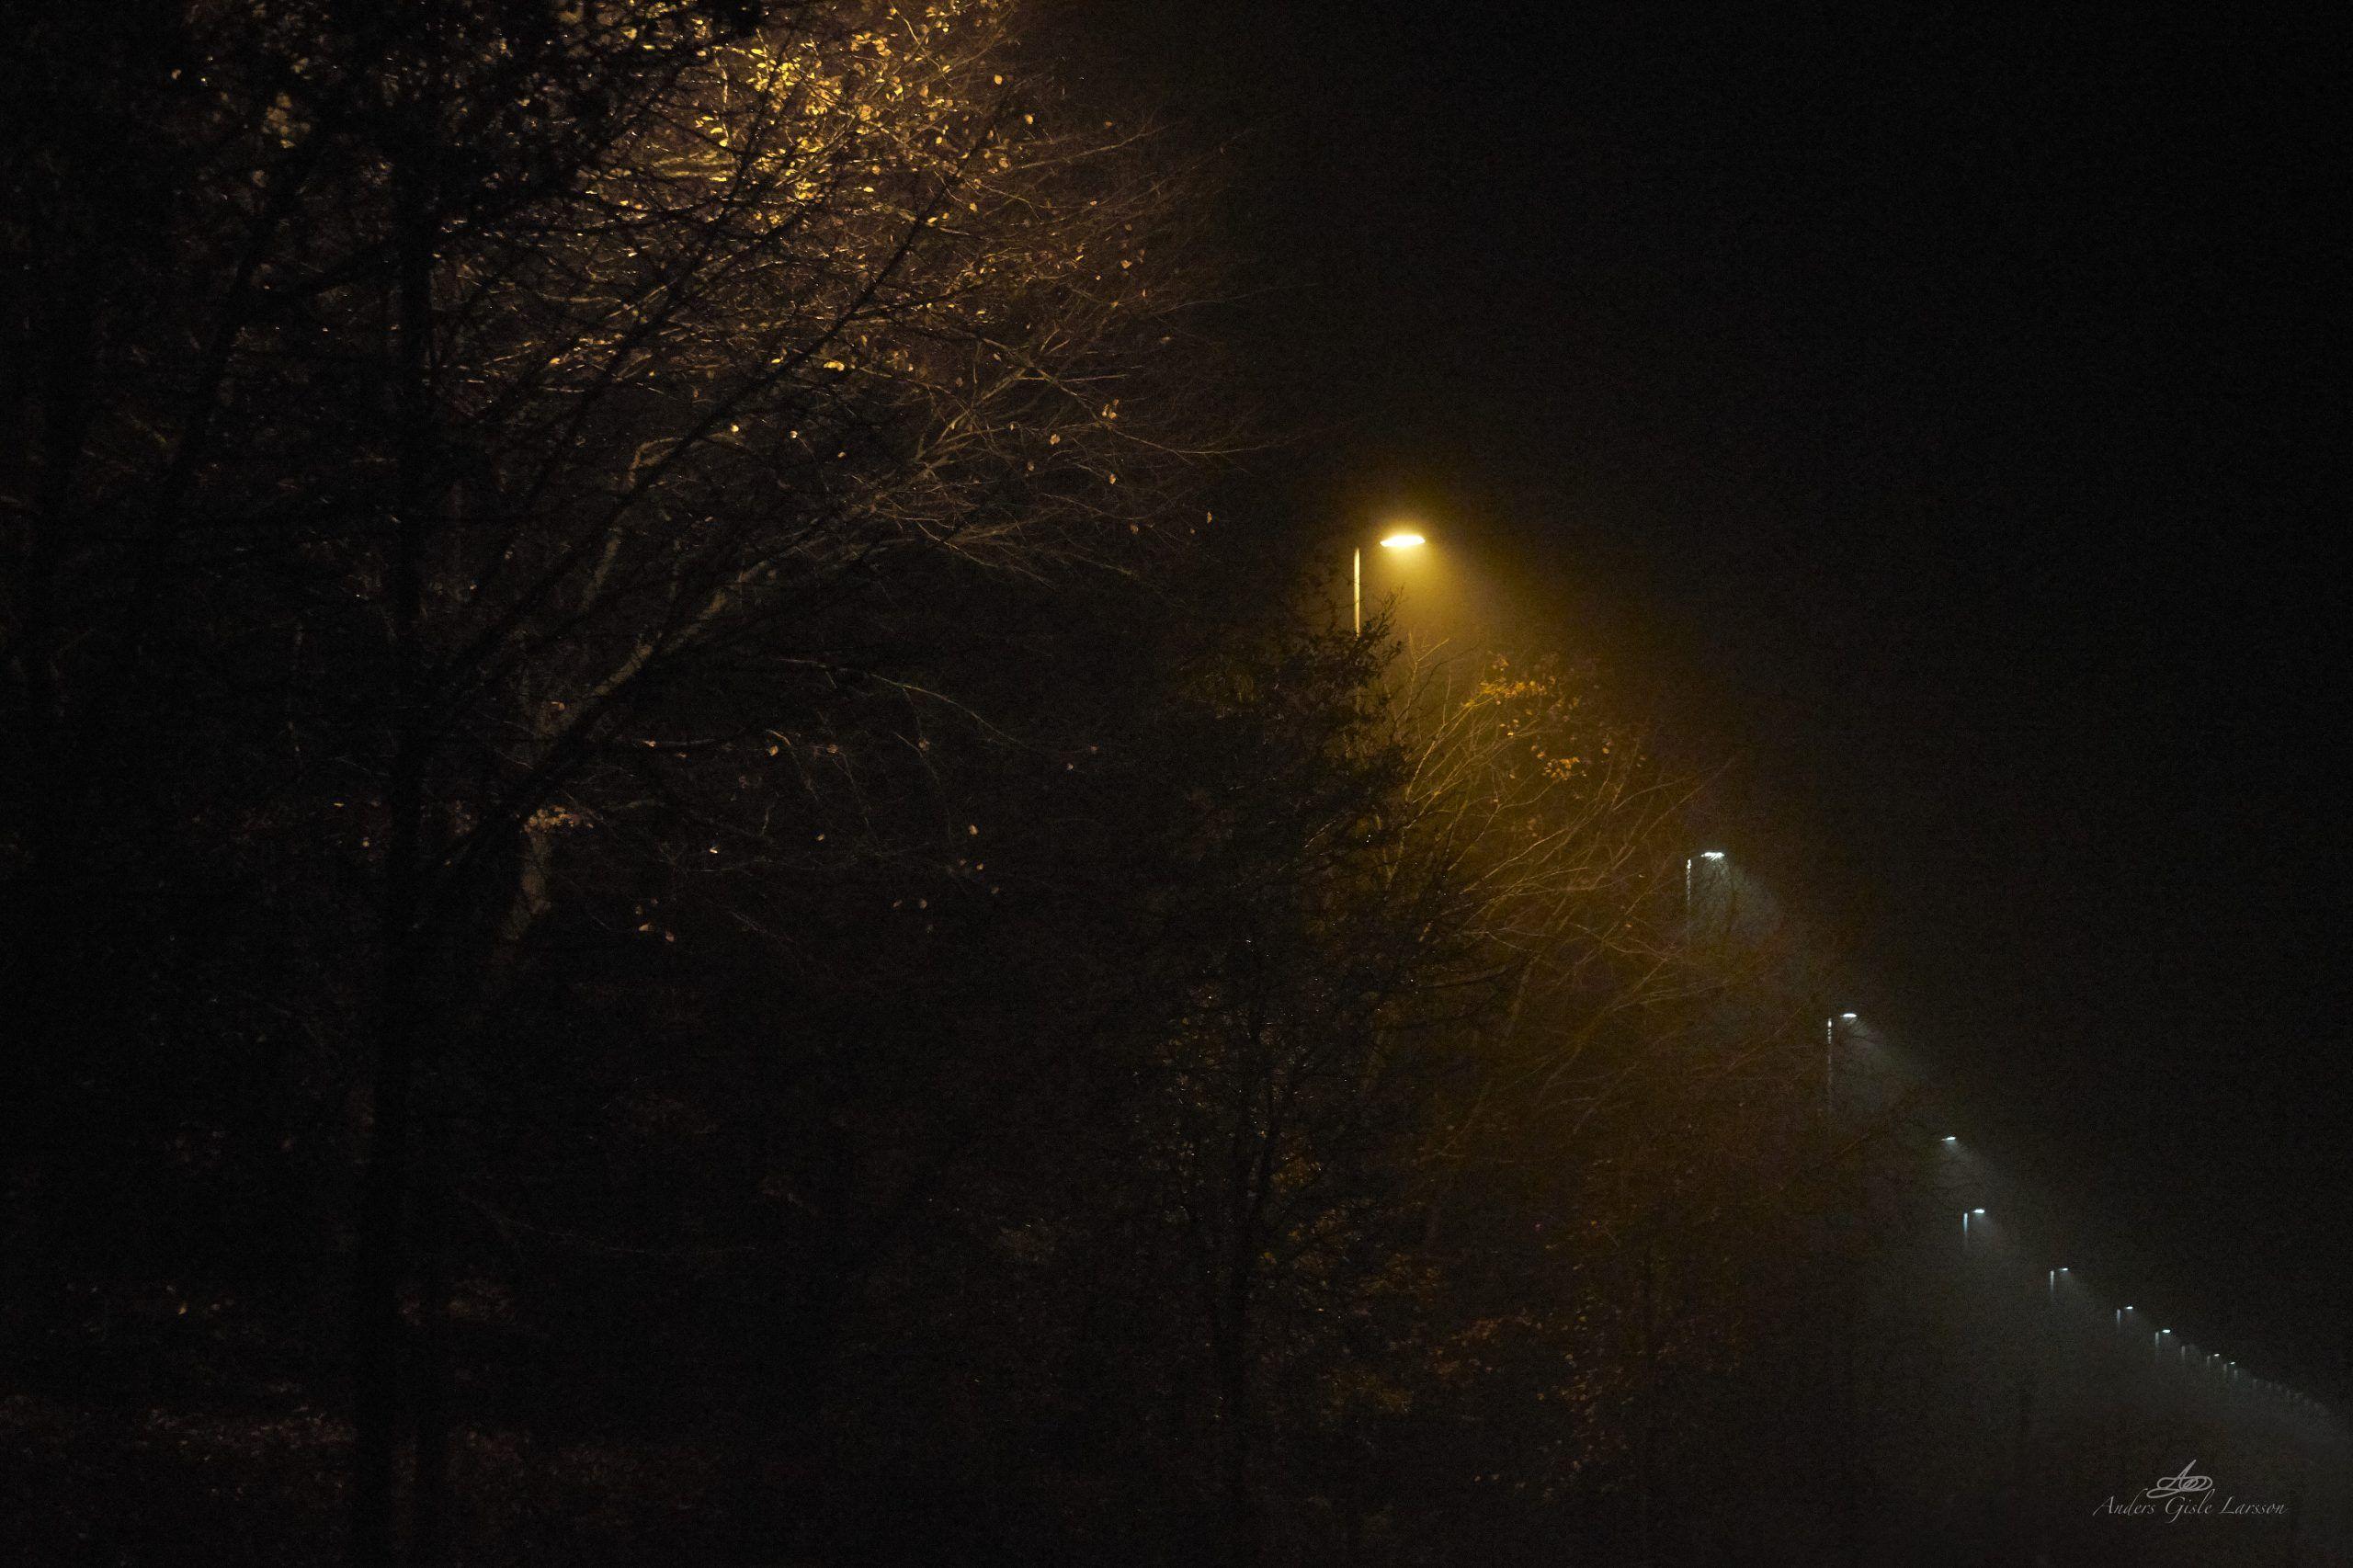 Tåge Lys, 311/365, Uge 45, Assentoft, Randers